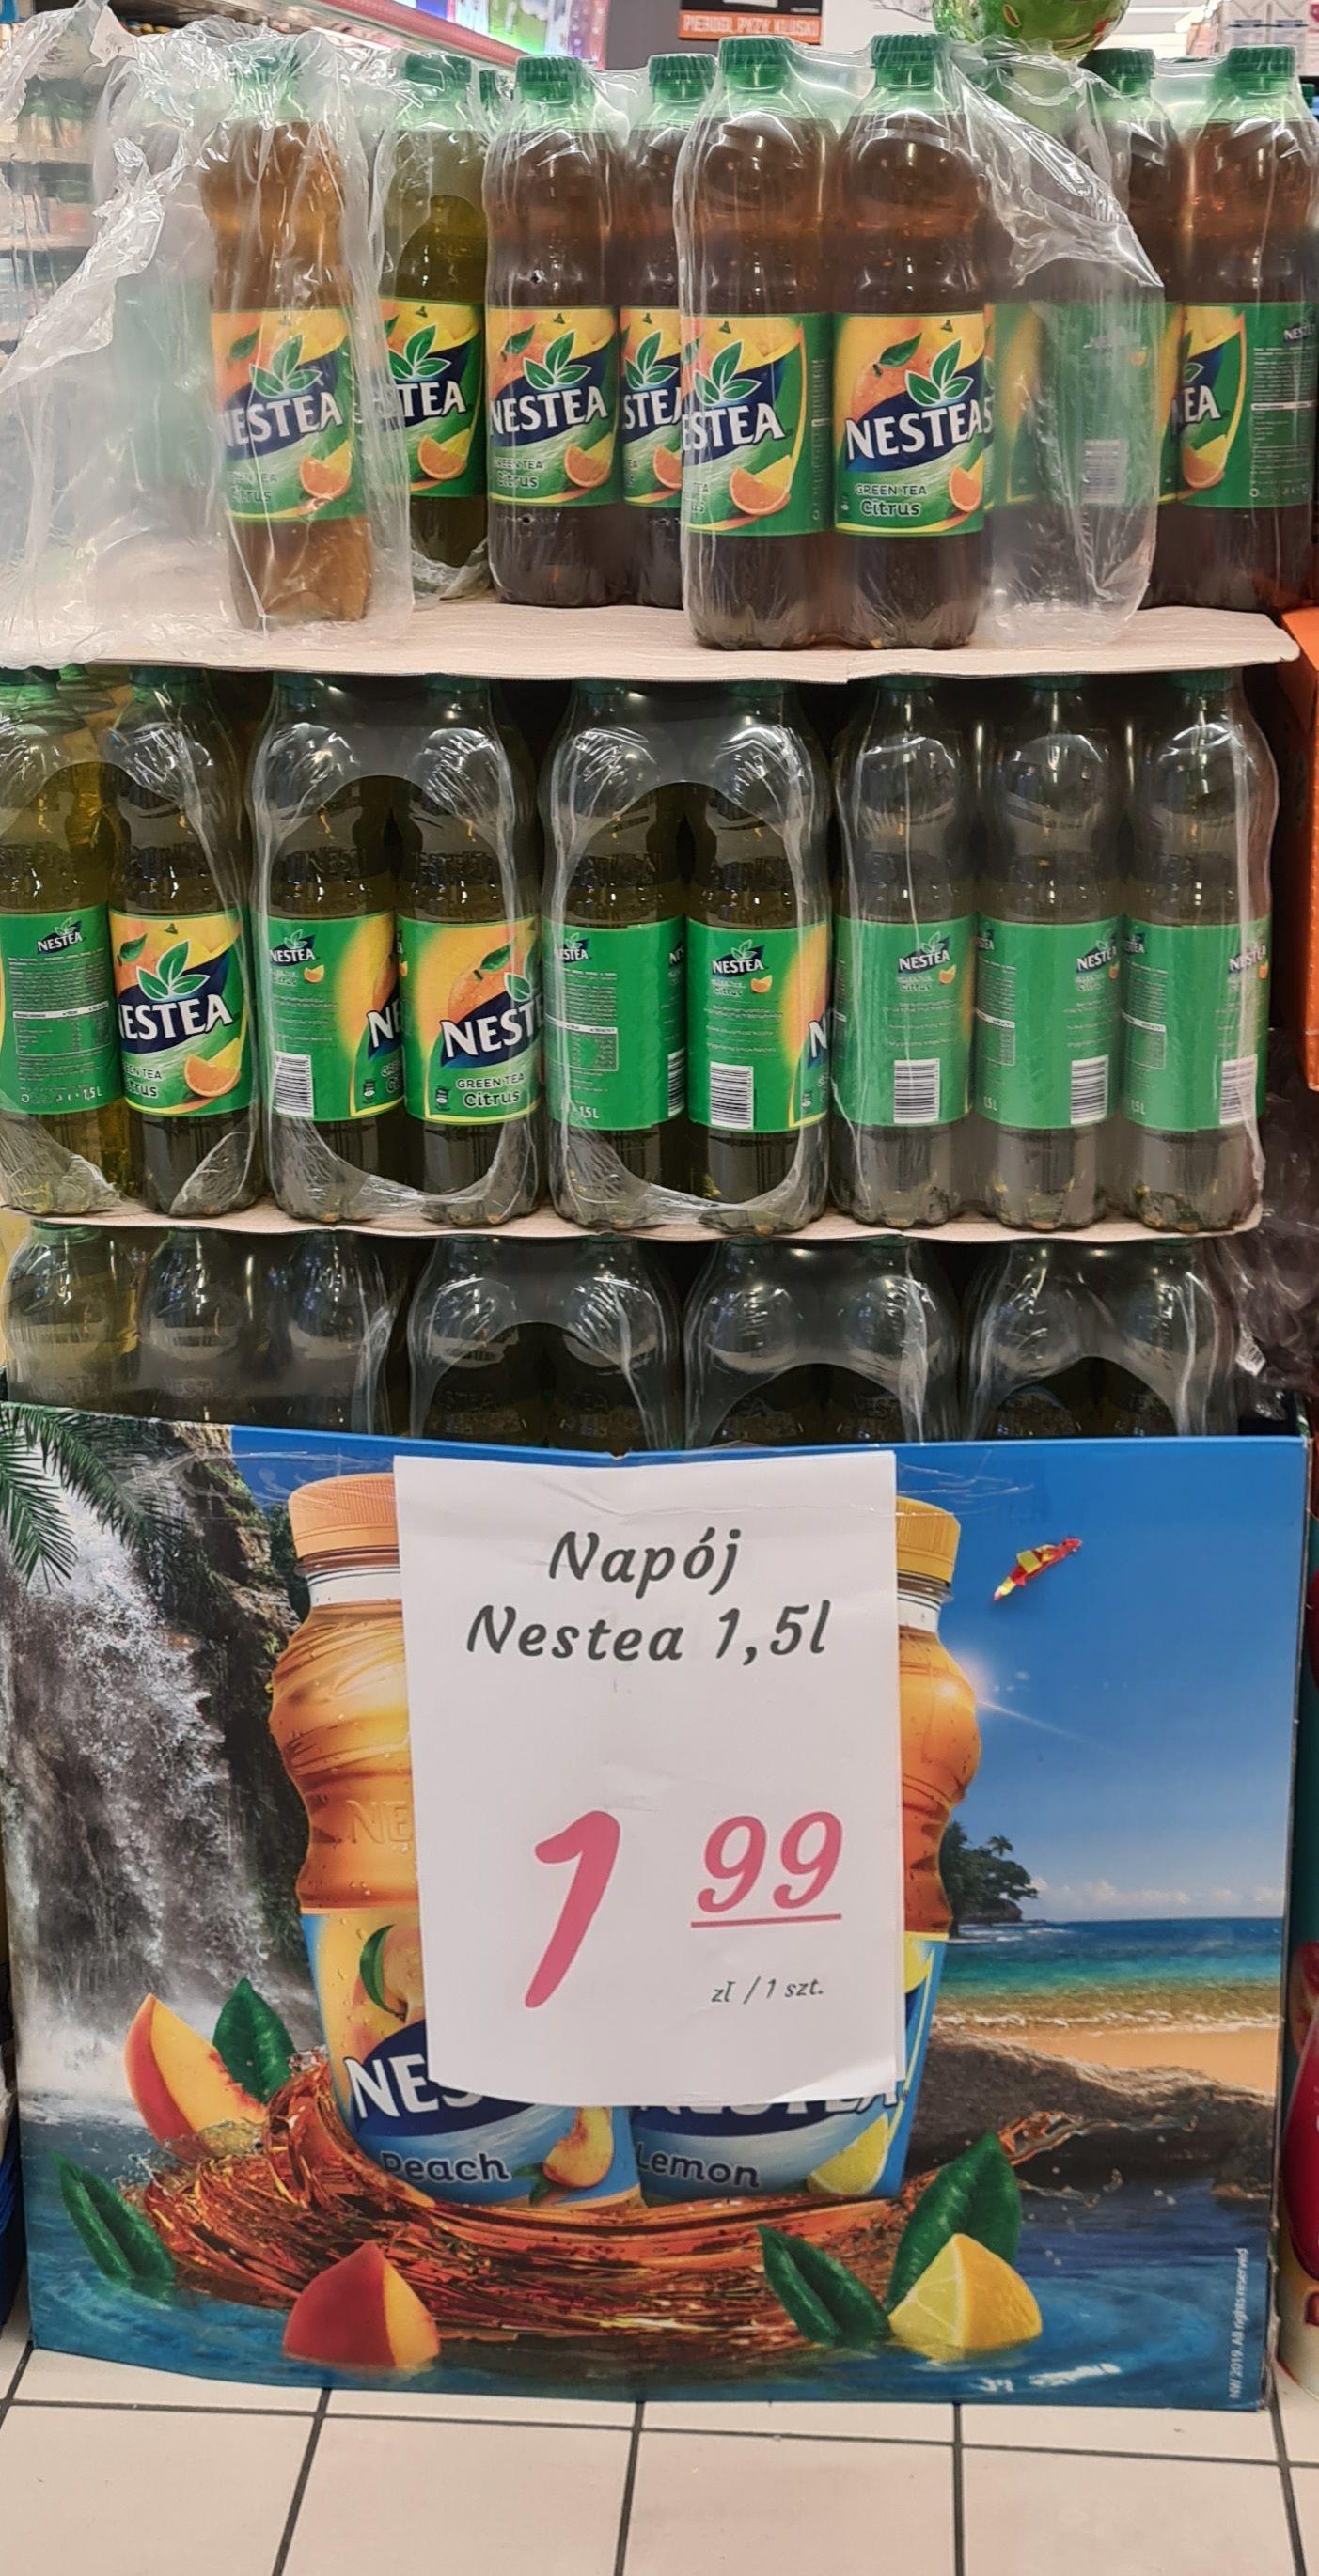 Nestea 1.5 l - Leclerc Wrocław